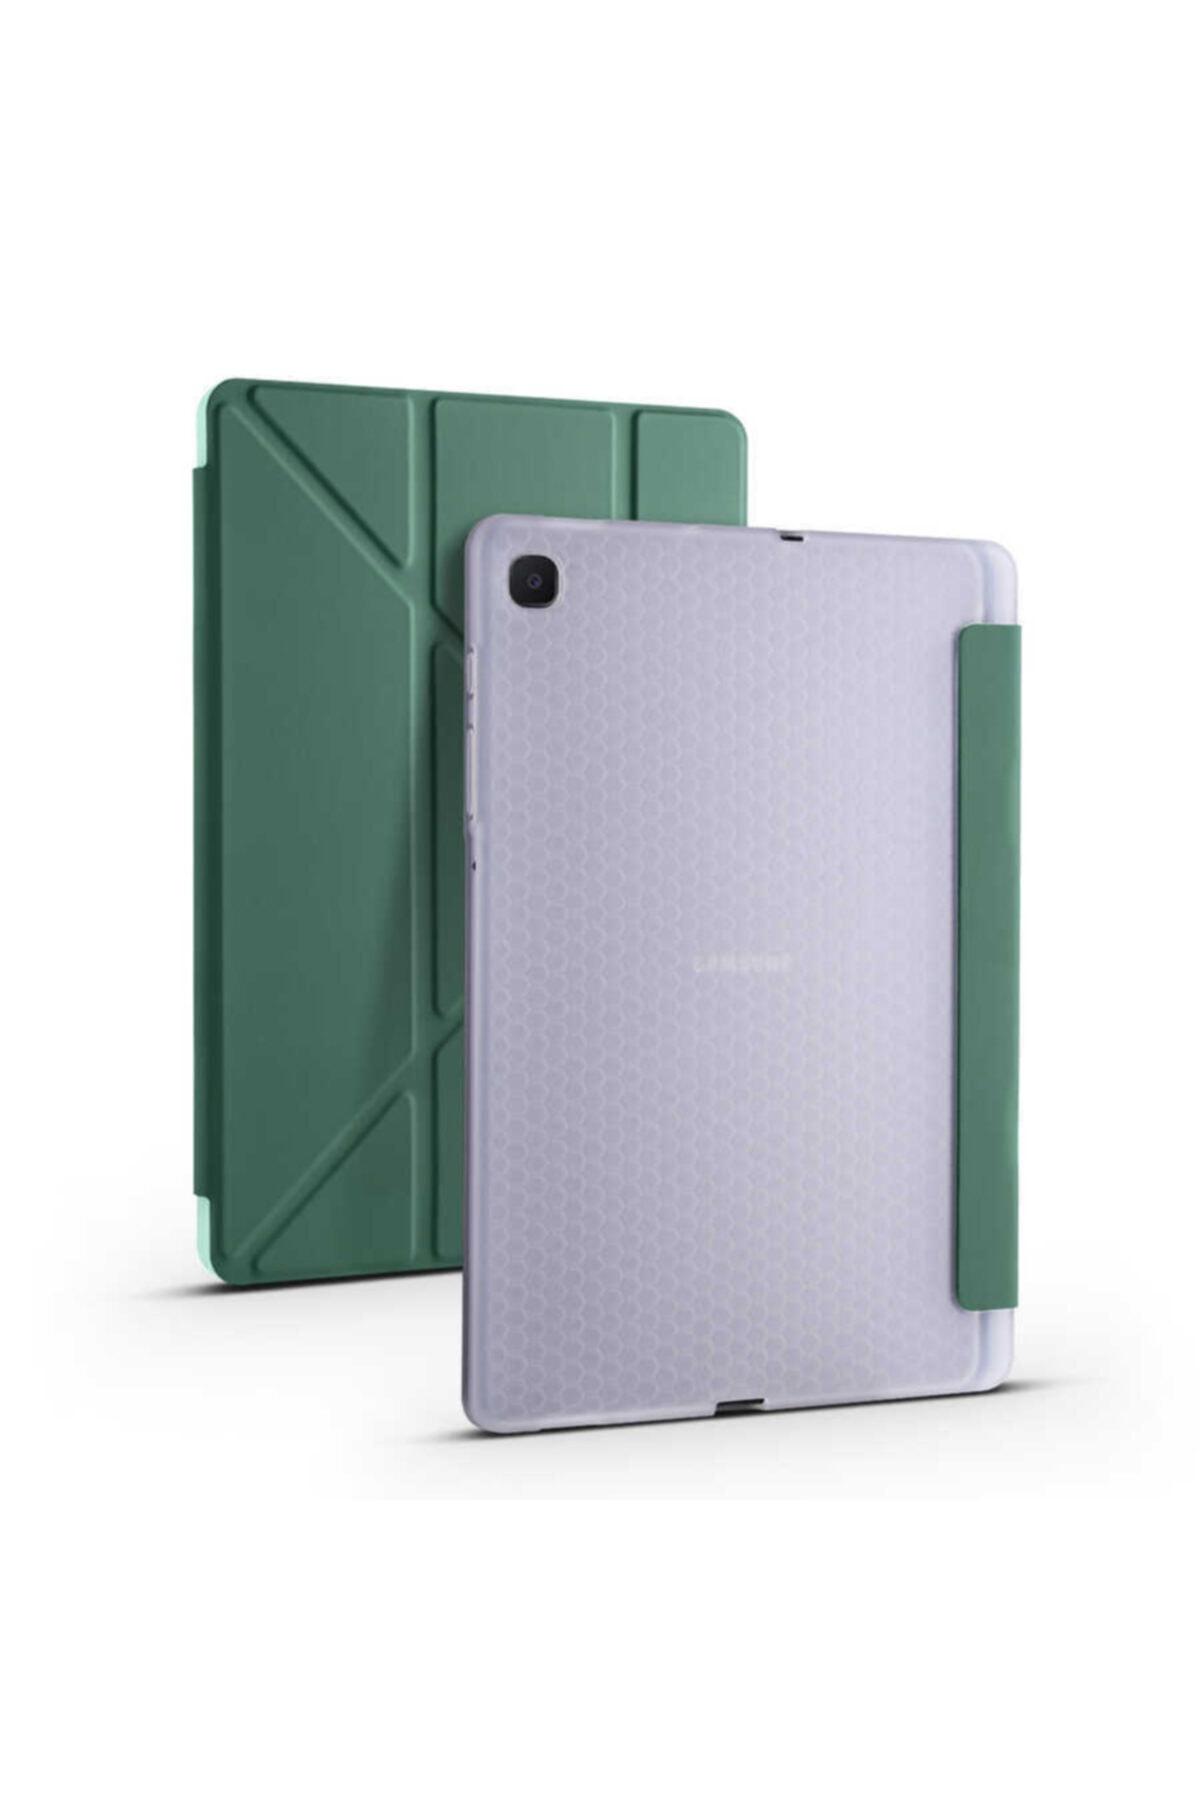 "Samsung Galaxy Tab S6 Lite Sm-p610 10.4"" Kılıf Kalem Bölmeli Smart Standlı Yumuşak Silikon Koruma"